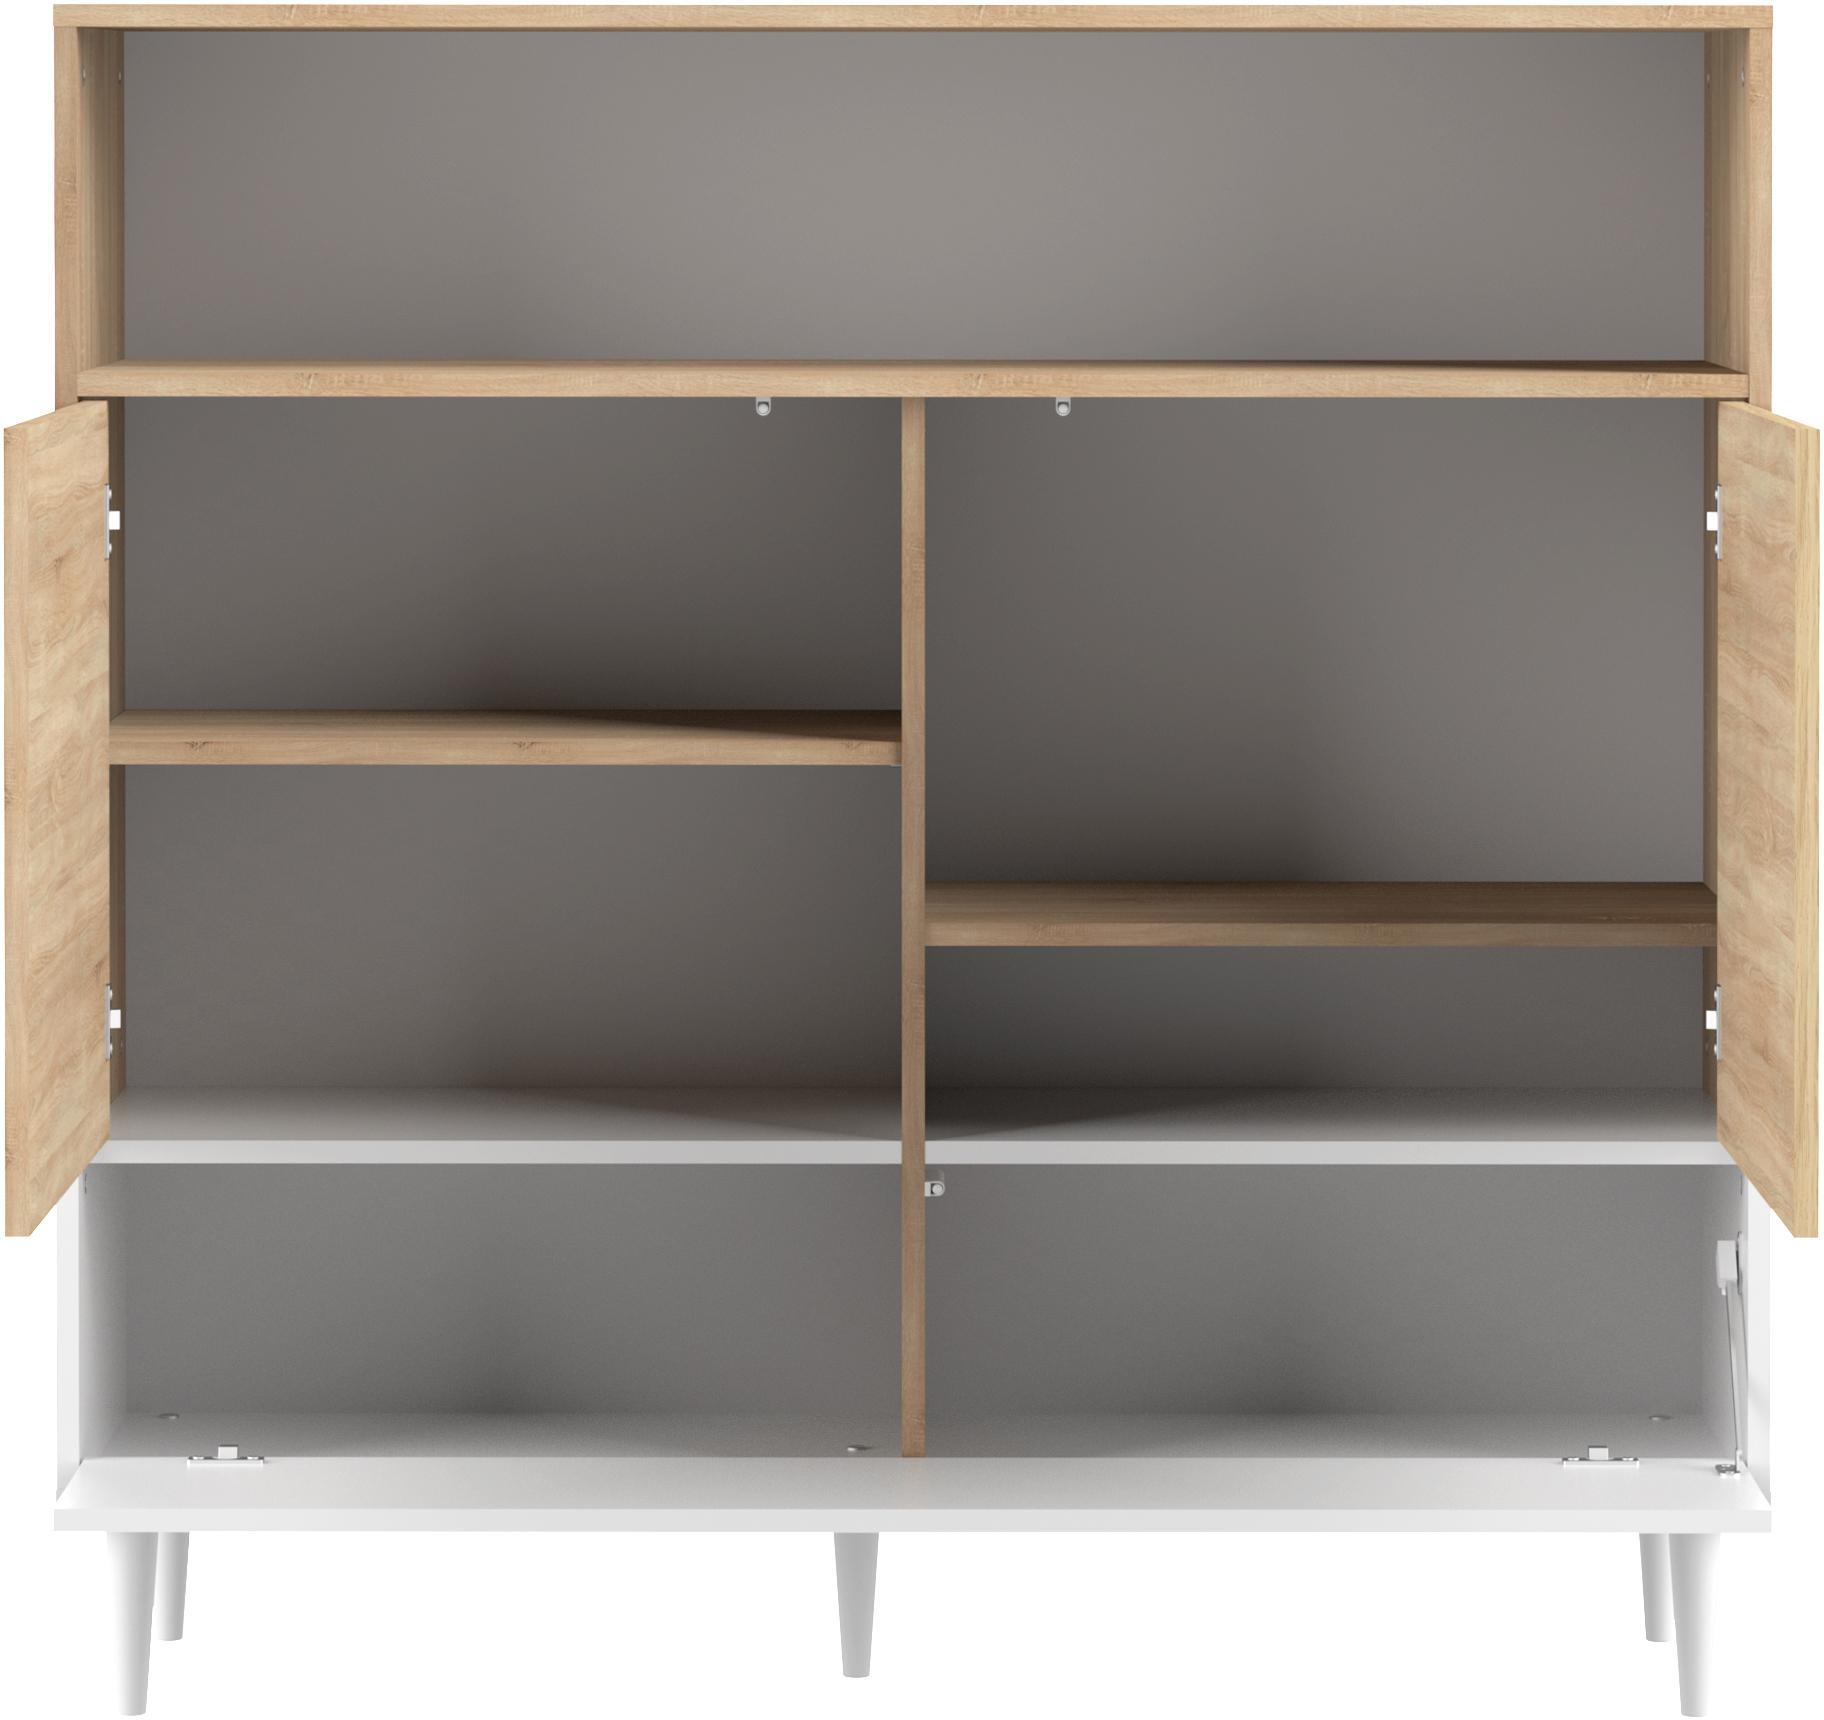 Highboard Horizon im Skandi Design, Korpus: Spanplatte, melaminbeschi, Füße: Buchenholz, massiv, lacki, Eichenholz, Weiß, 120 x 121 cm